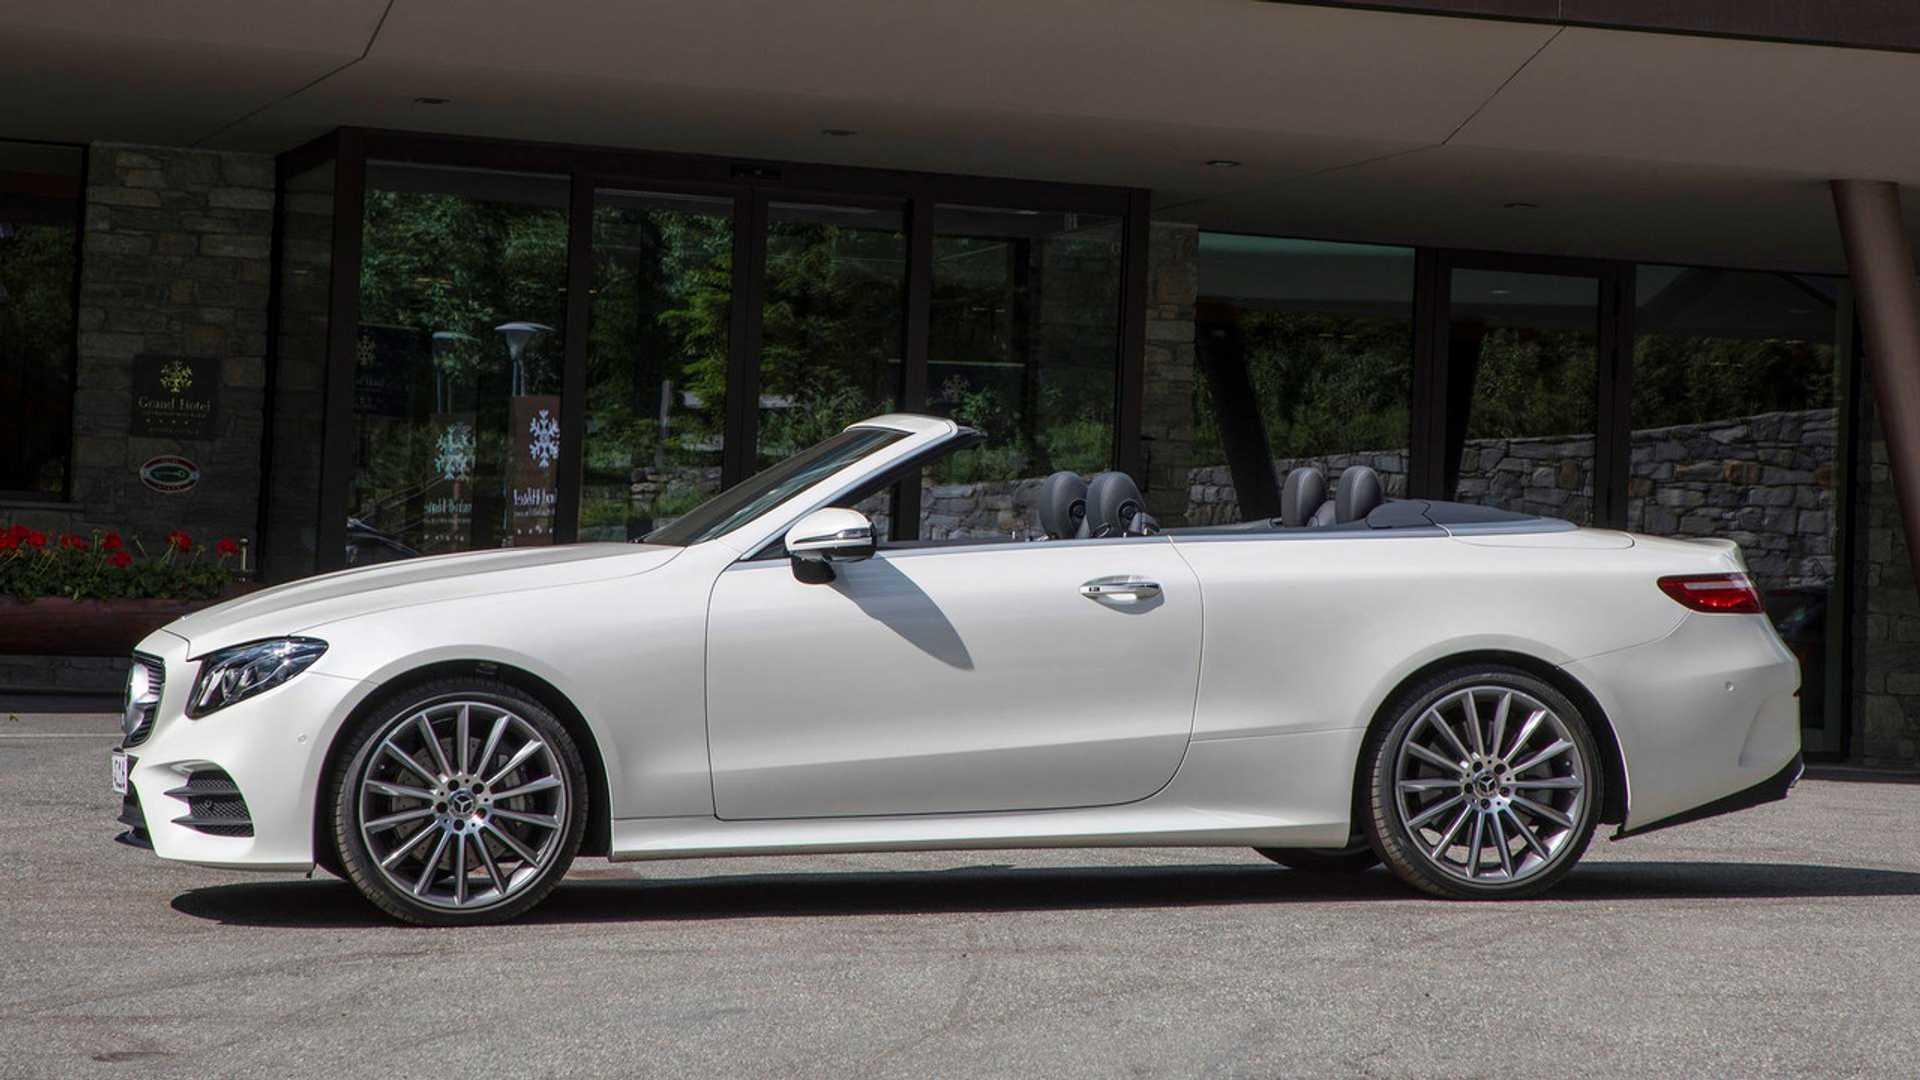 2018 E400 Convertible >> Most Expensive 2018 Mercedes Benz E400 Cabriolet Costs 96 395